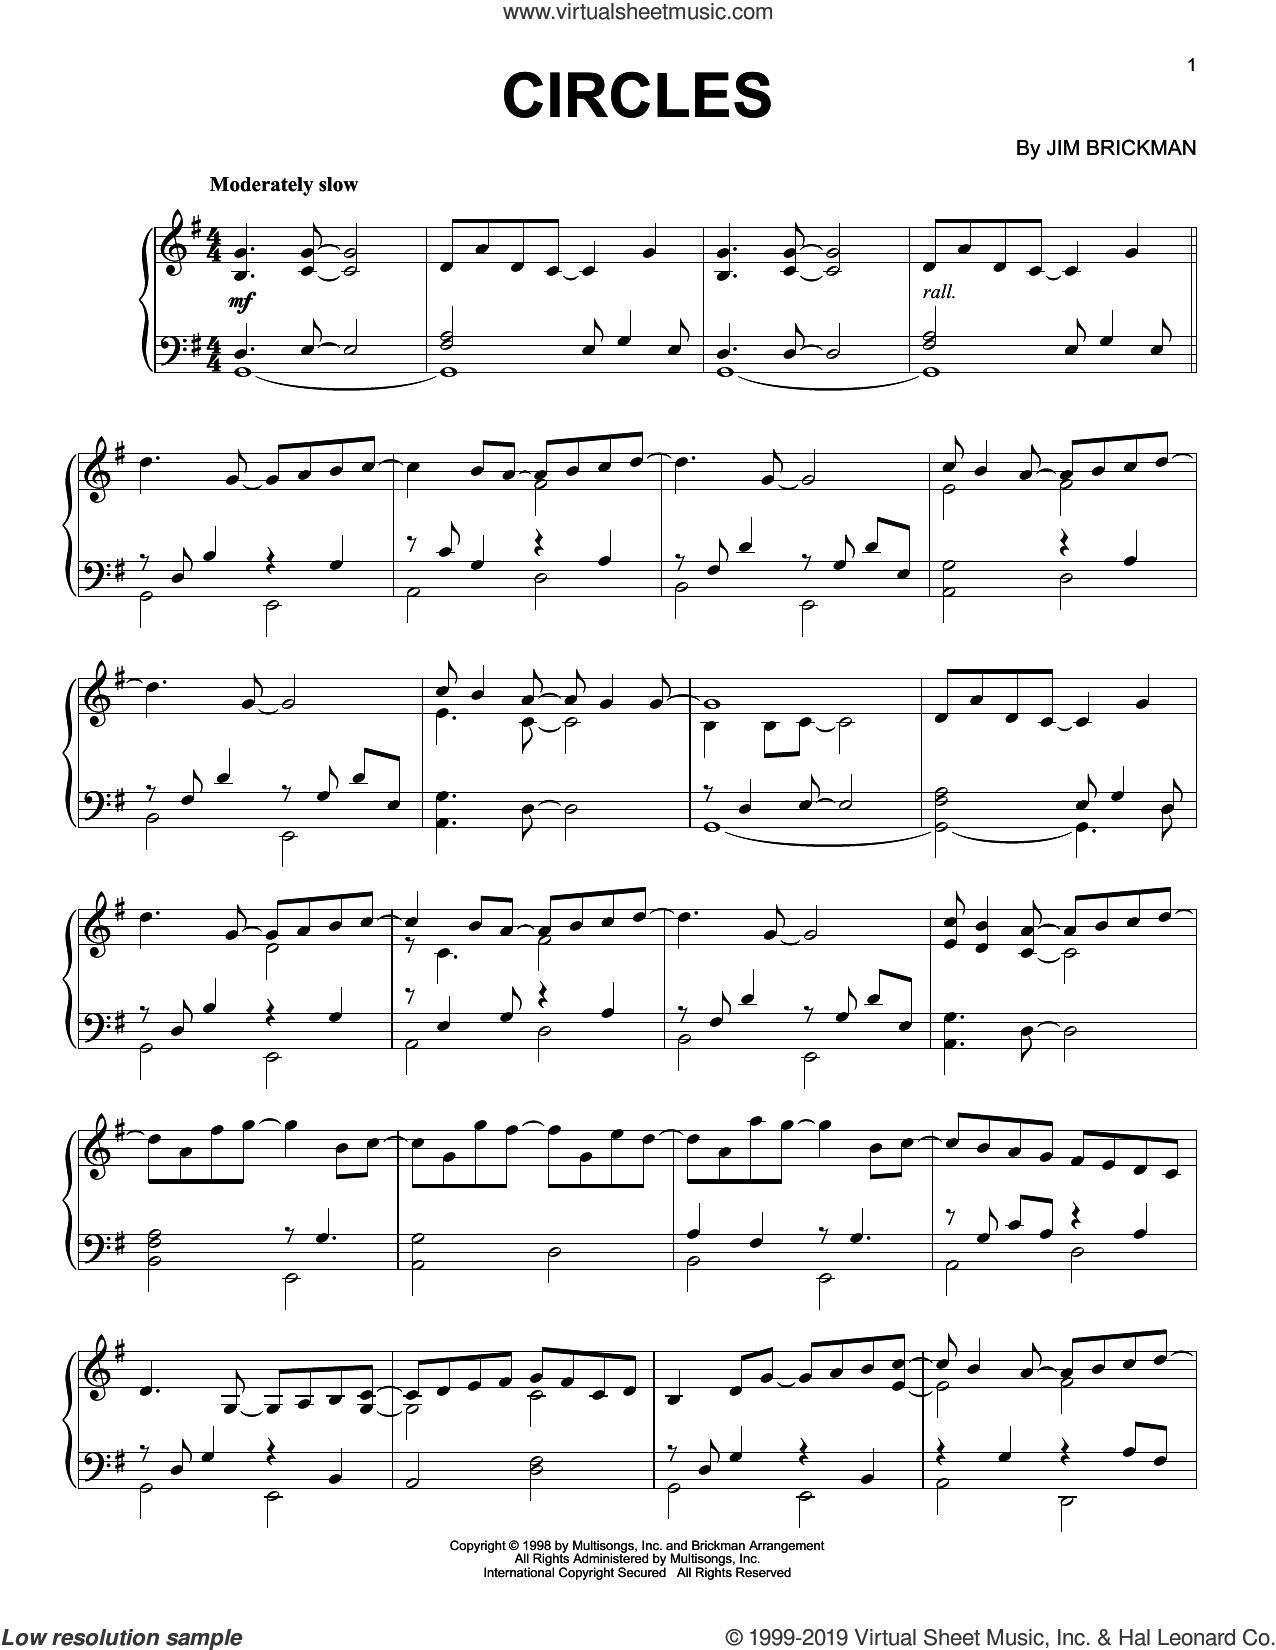 Circles sheet music for piano solo by Jim Brickman, intermediate skill level